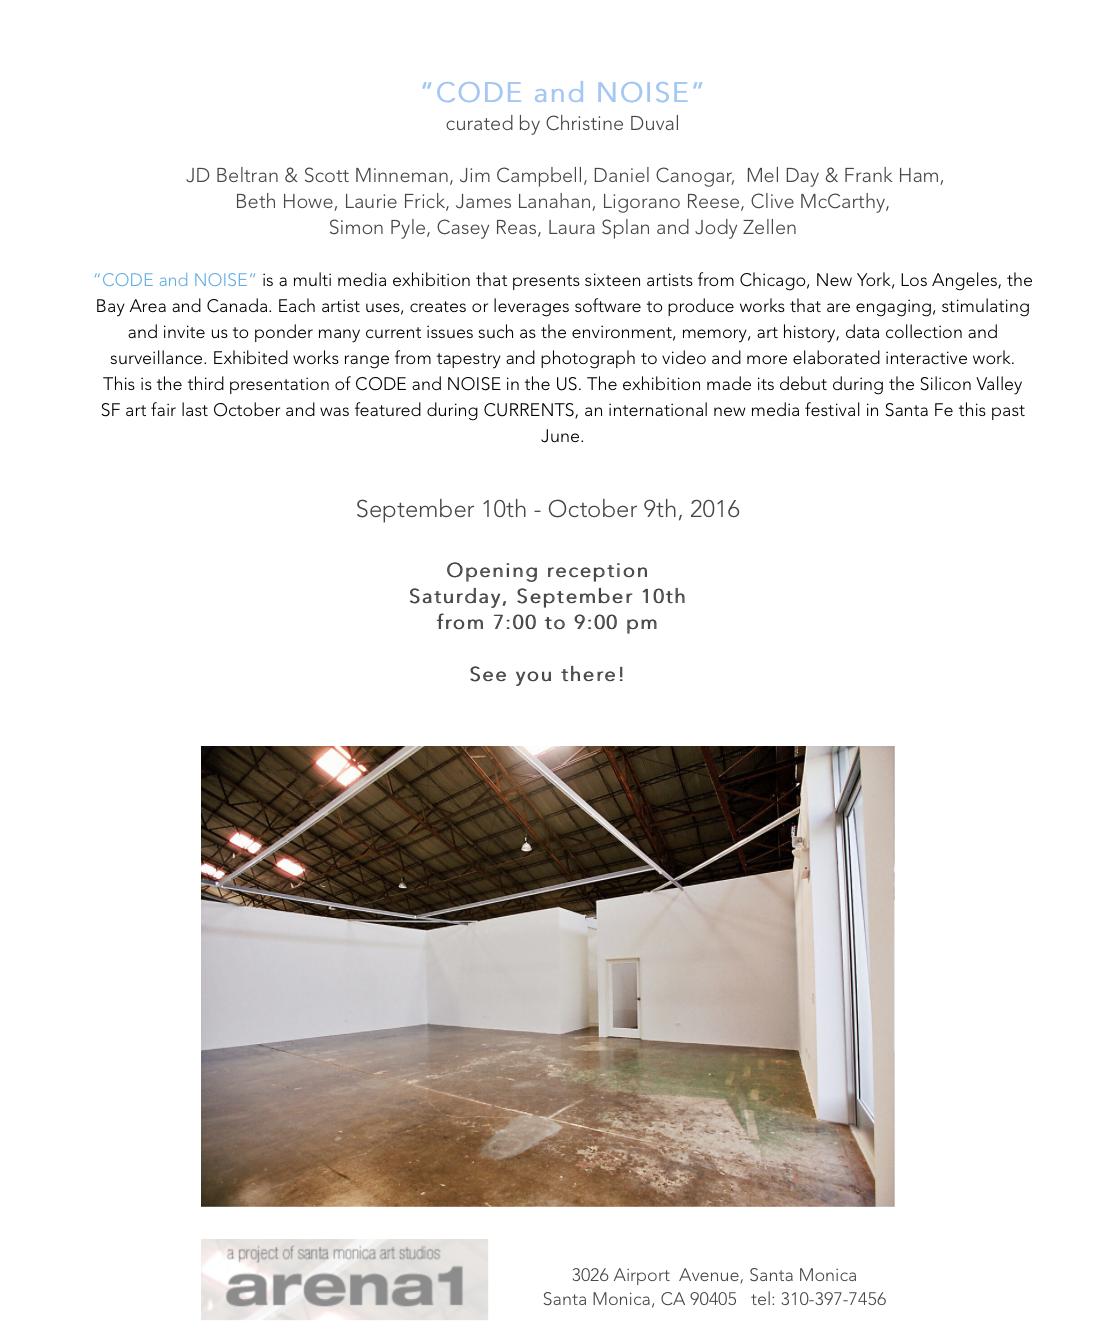 Arena1 Gallery, Santa Monica